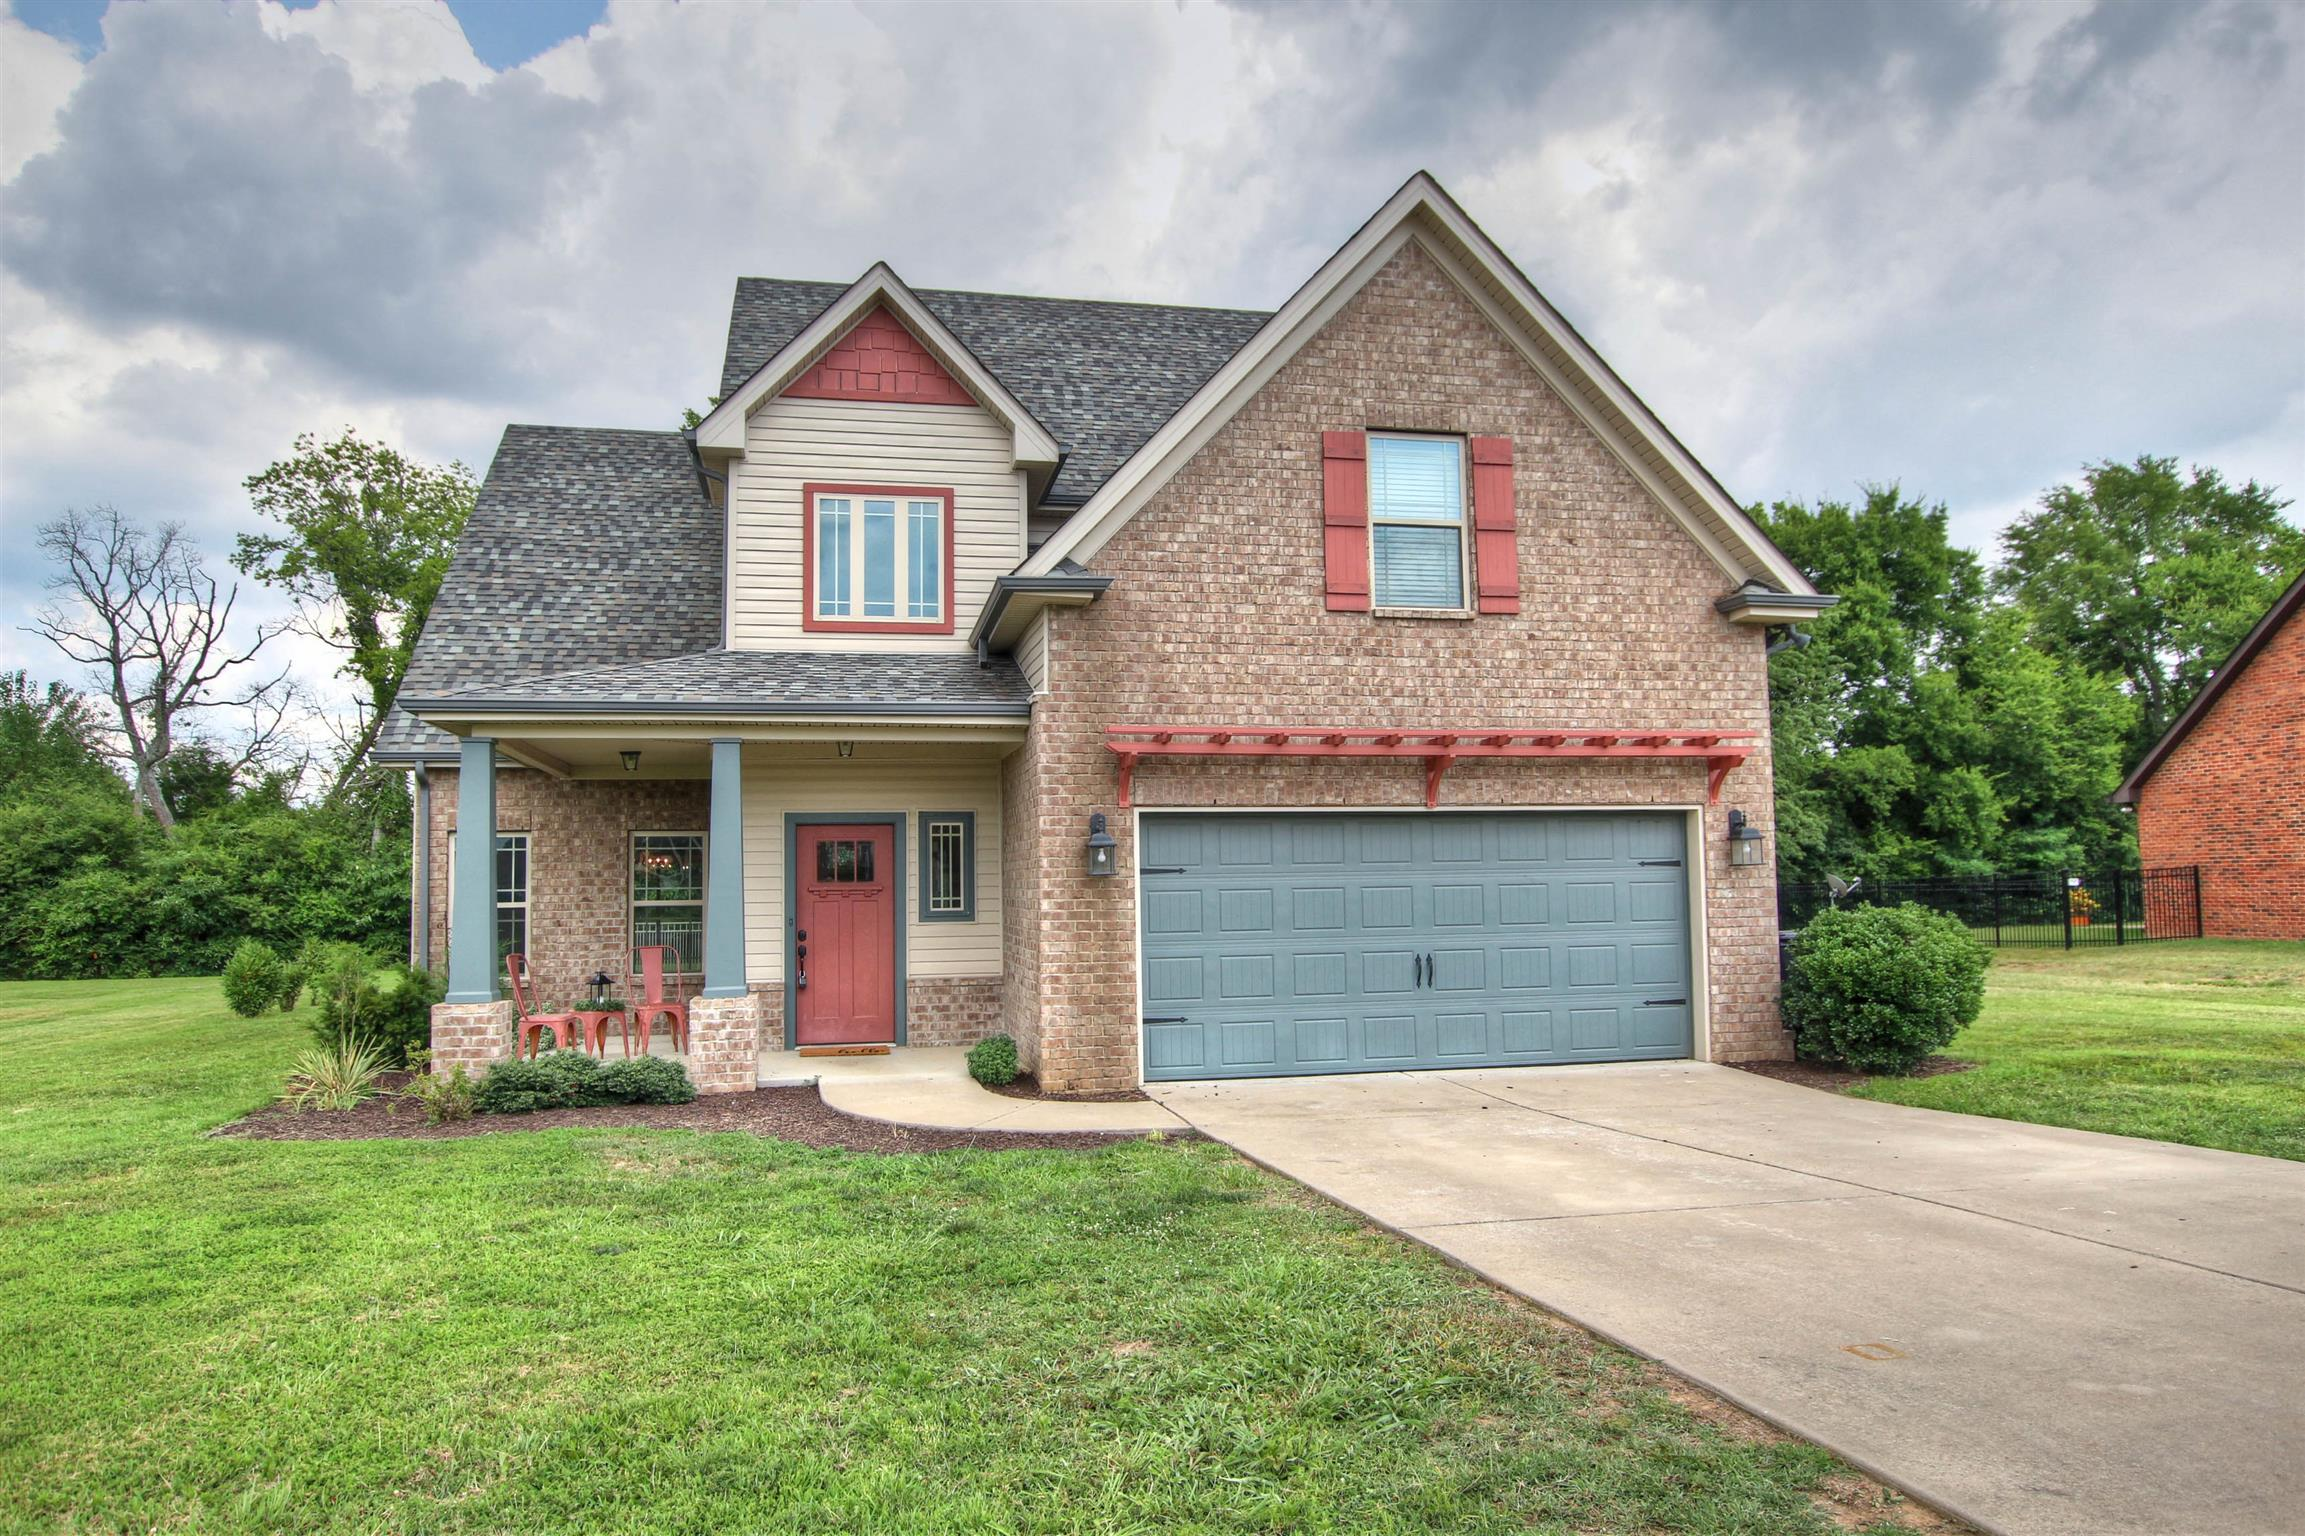 4216 Princeton Oaks Ln, Murfreesboro, TN 37129 - Murfreesboro, TN real estate listing